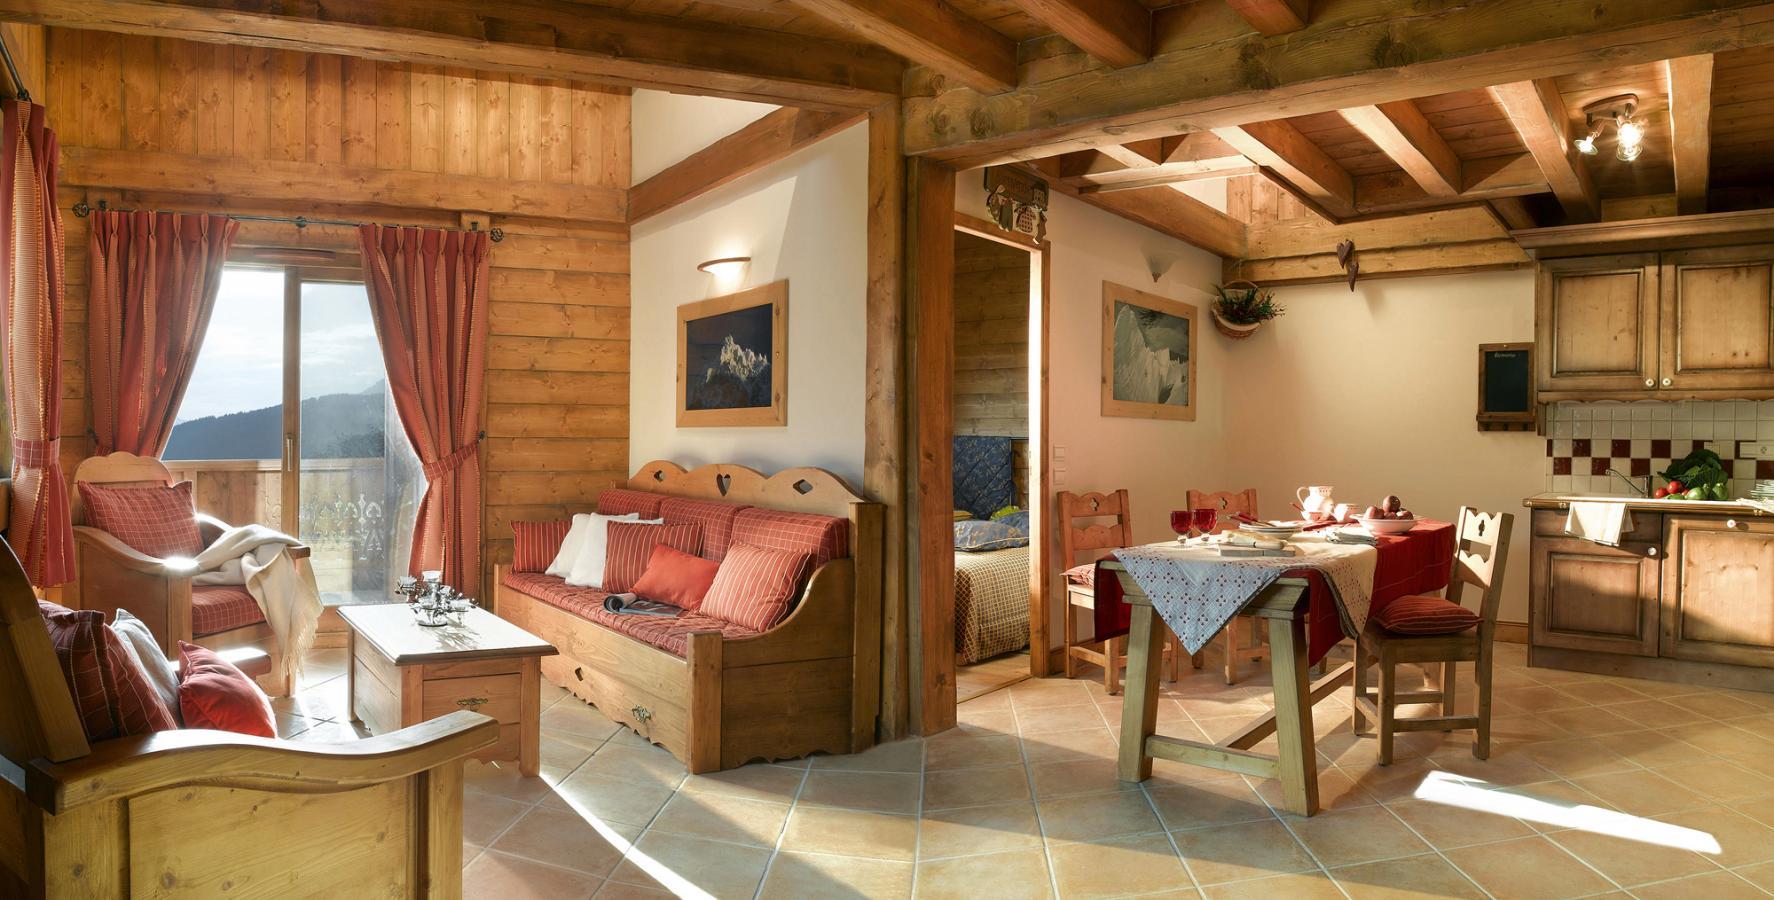 Location ski prestige vacances au ski en r sidence haut de gamme avec ski planet - Residence de luxe montagne locati ...